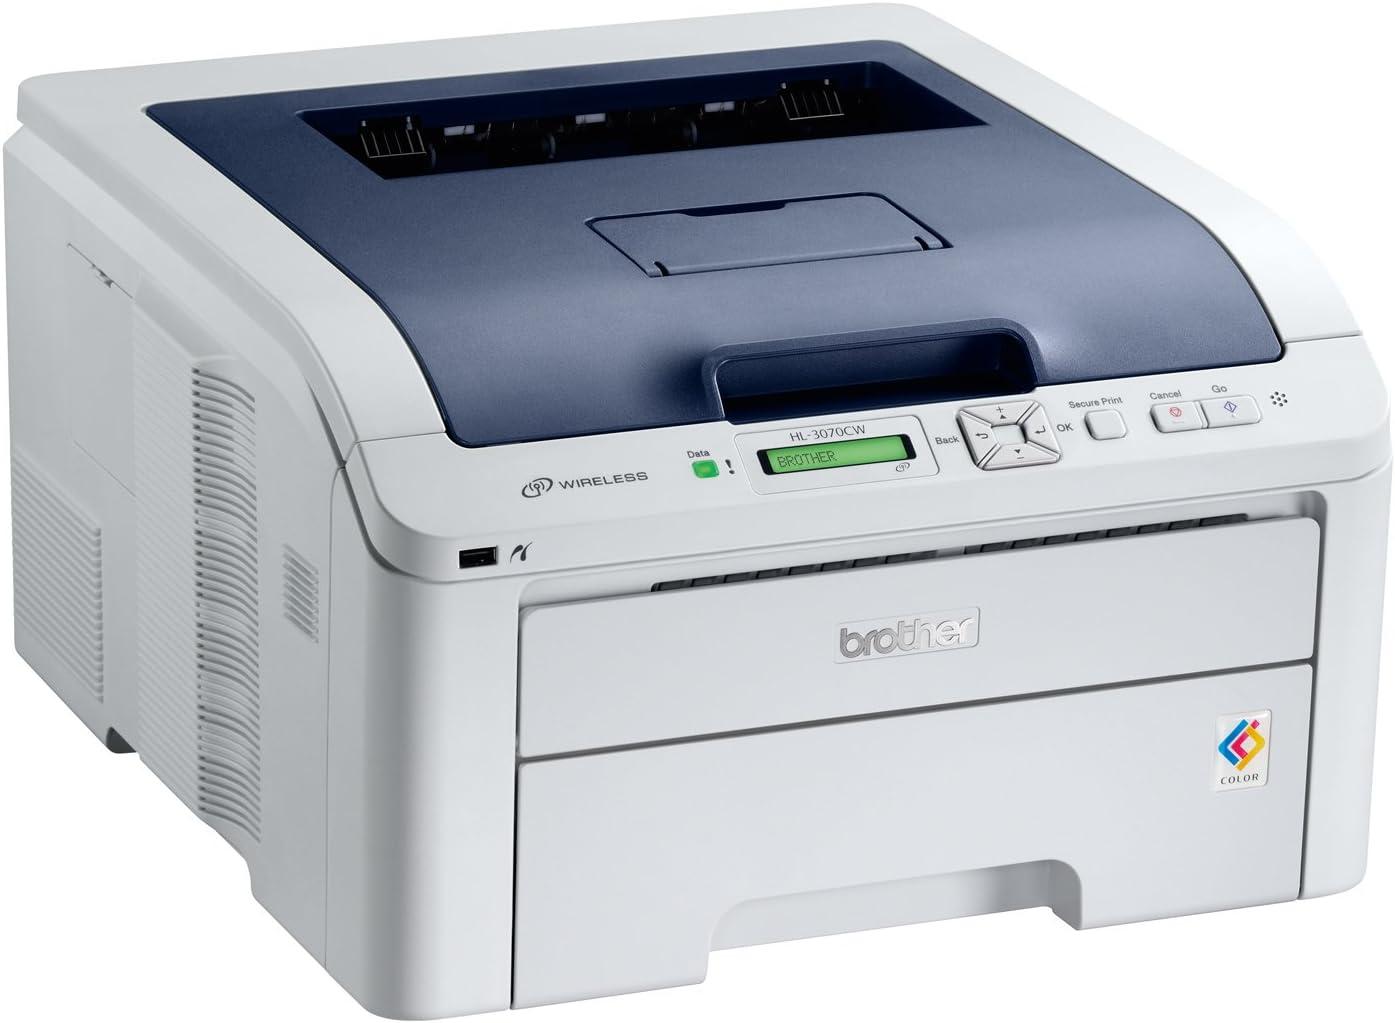 Brother HL3070CW - Impresora láser Color (A4, 16 ppm, WiFi ...